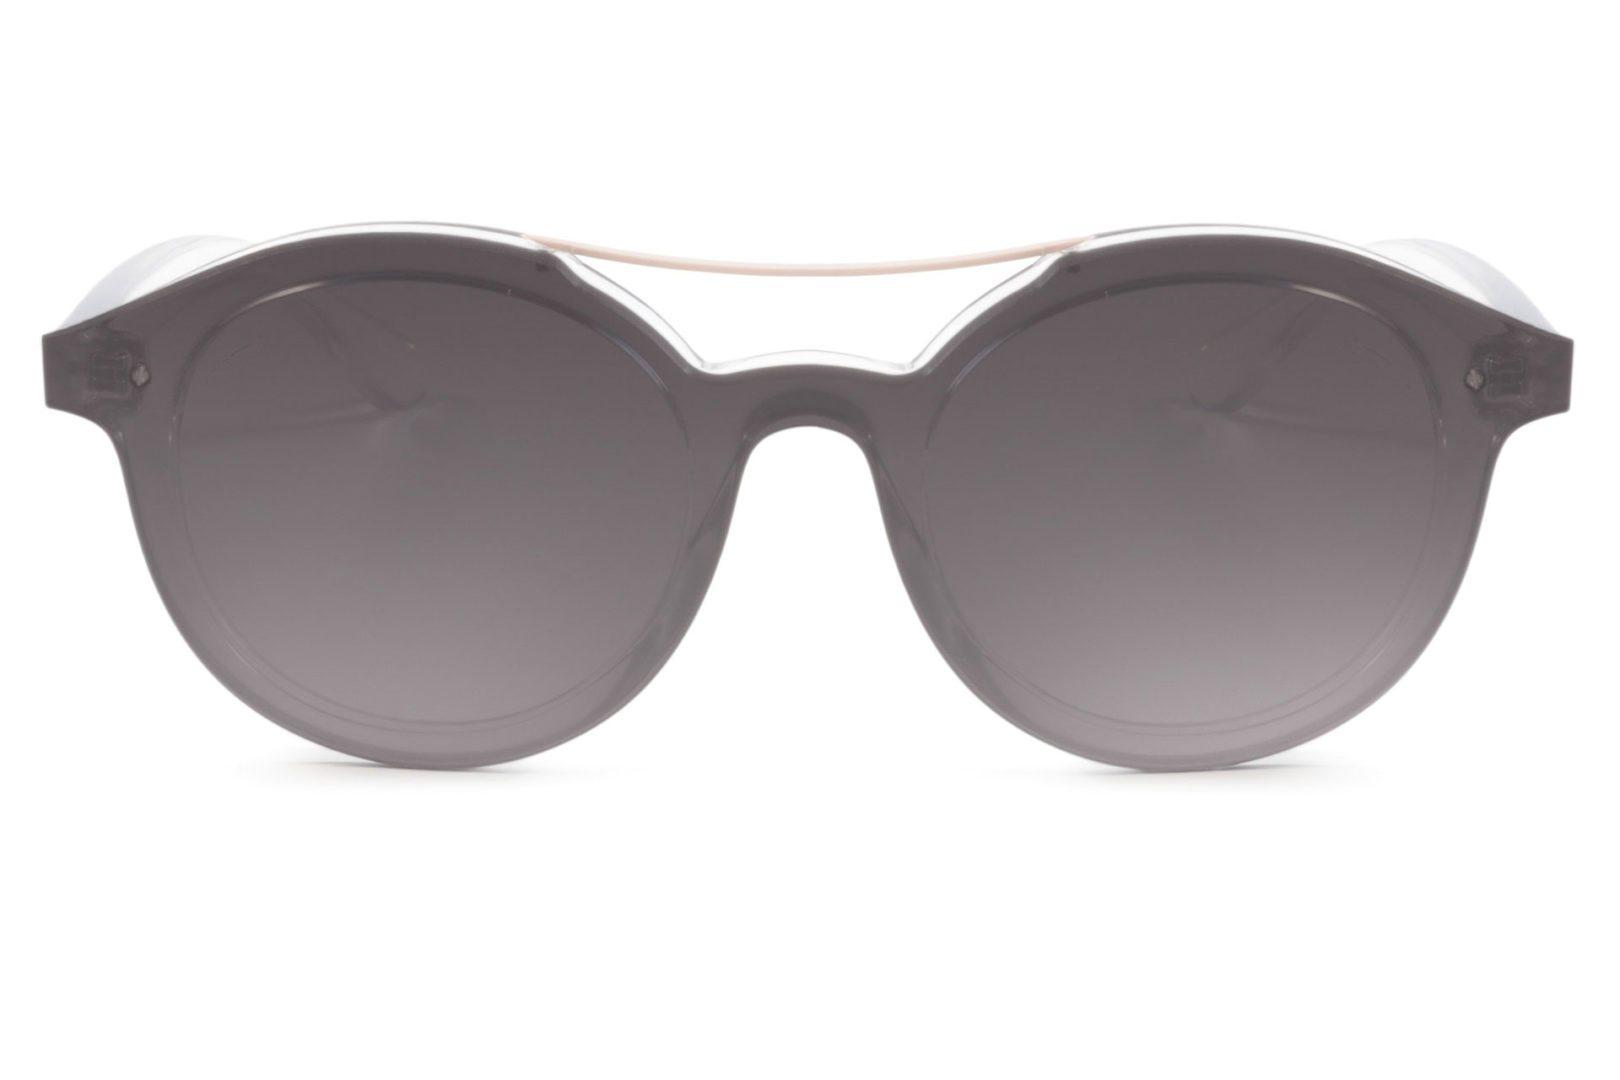 occhiali da sole saraghina